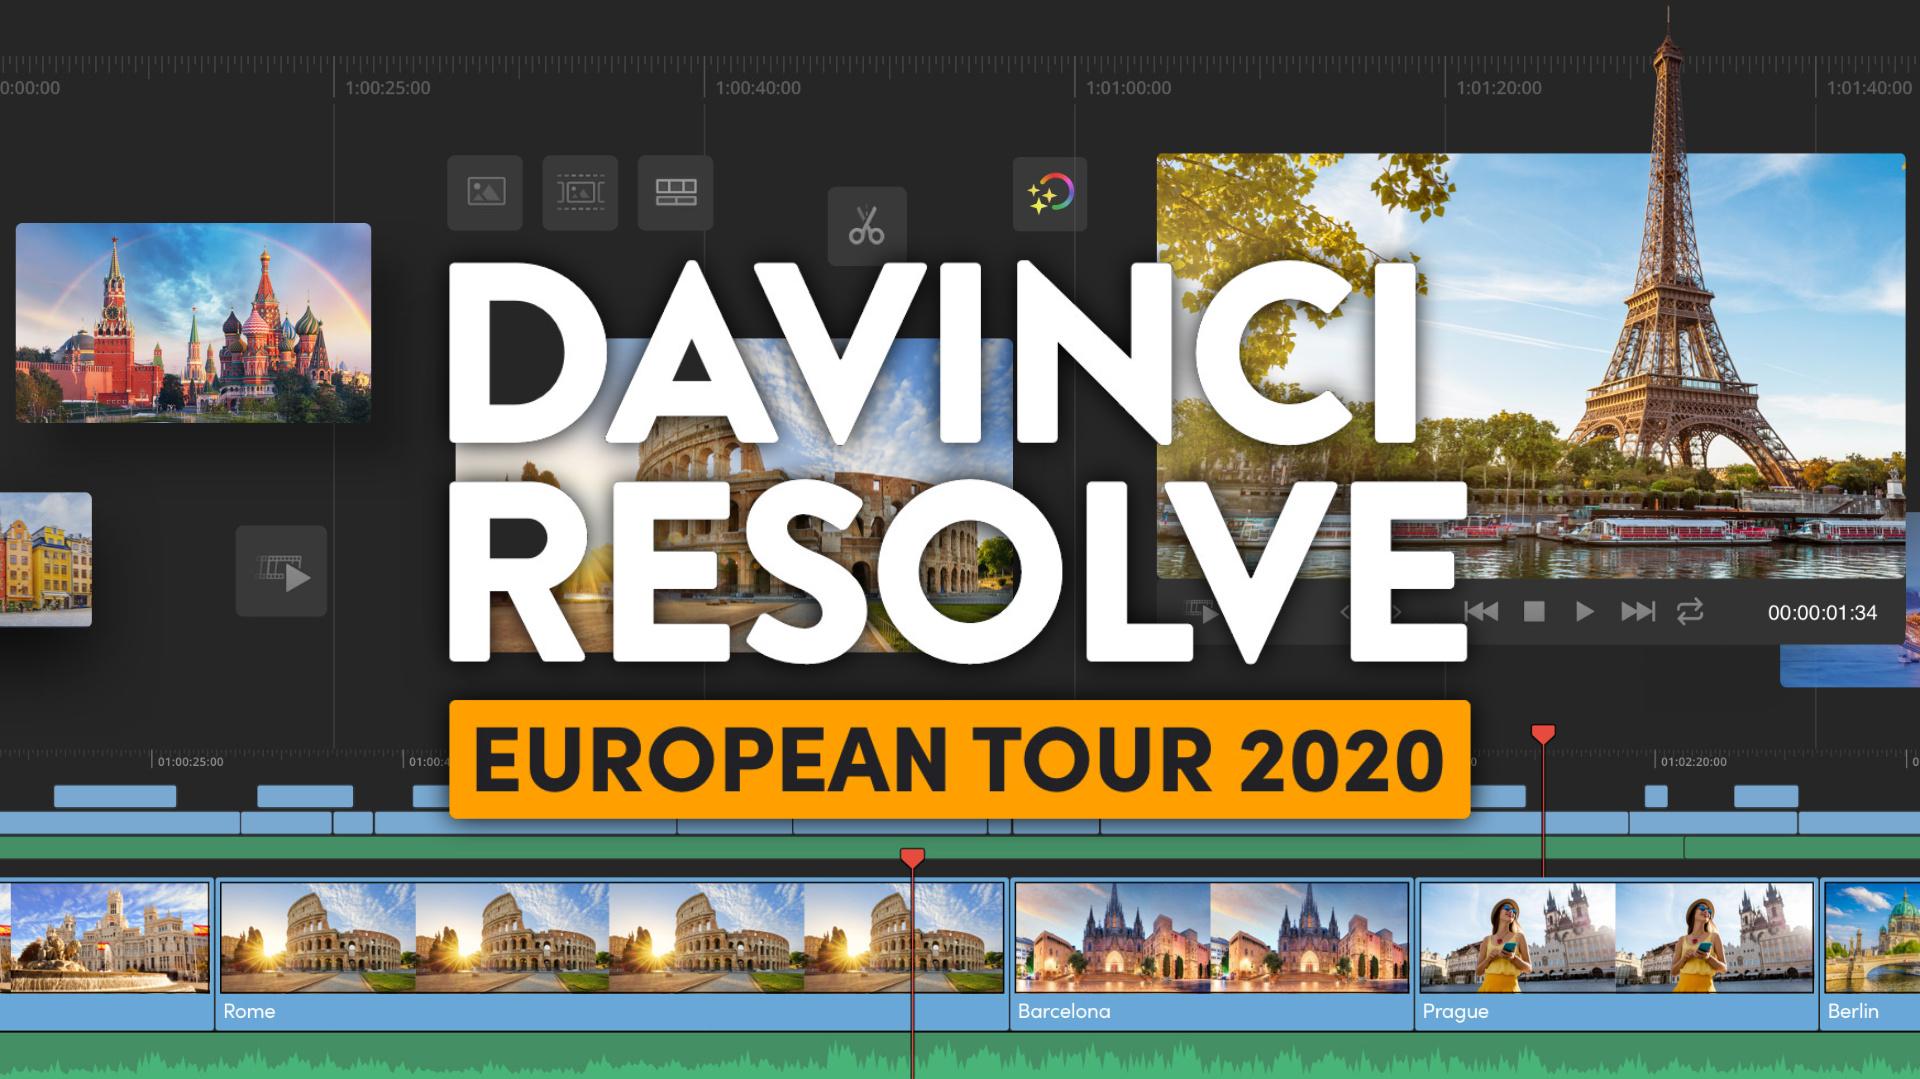 Aprende DaVinci Resolve gratis – gira europea que incluye a más de 35 ciudades